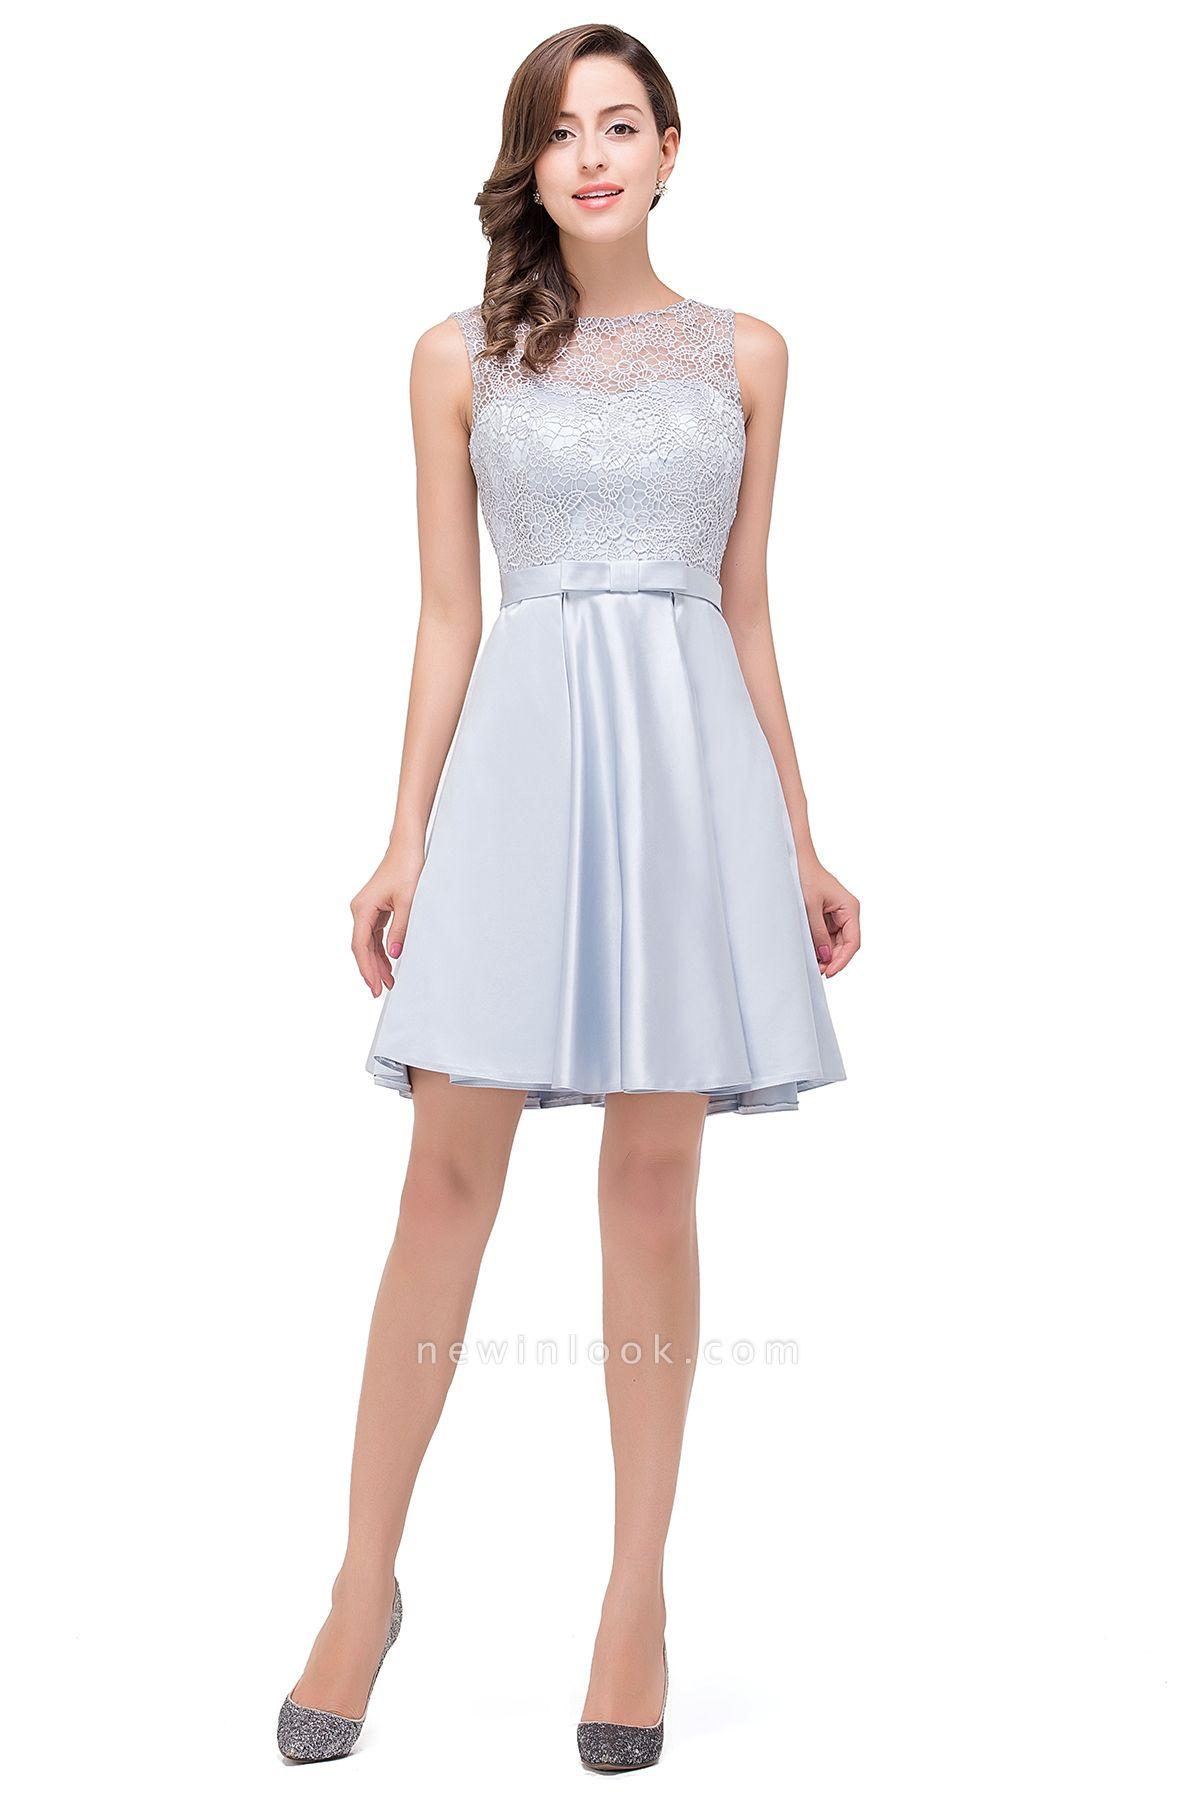 Vestidos de baile cortos de encaje | sin mangas de raso elegante hasta la rodilla